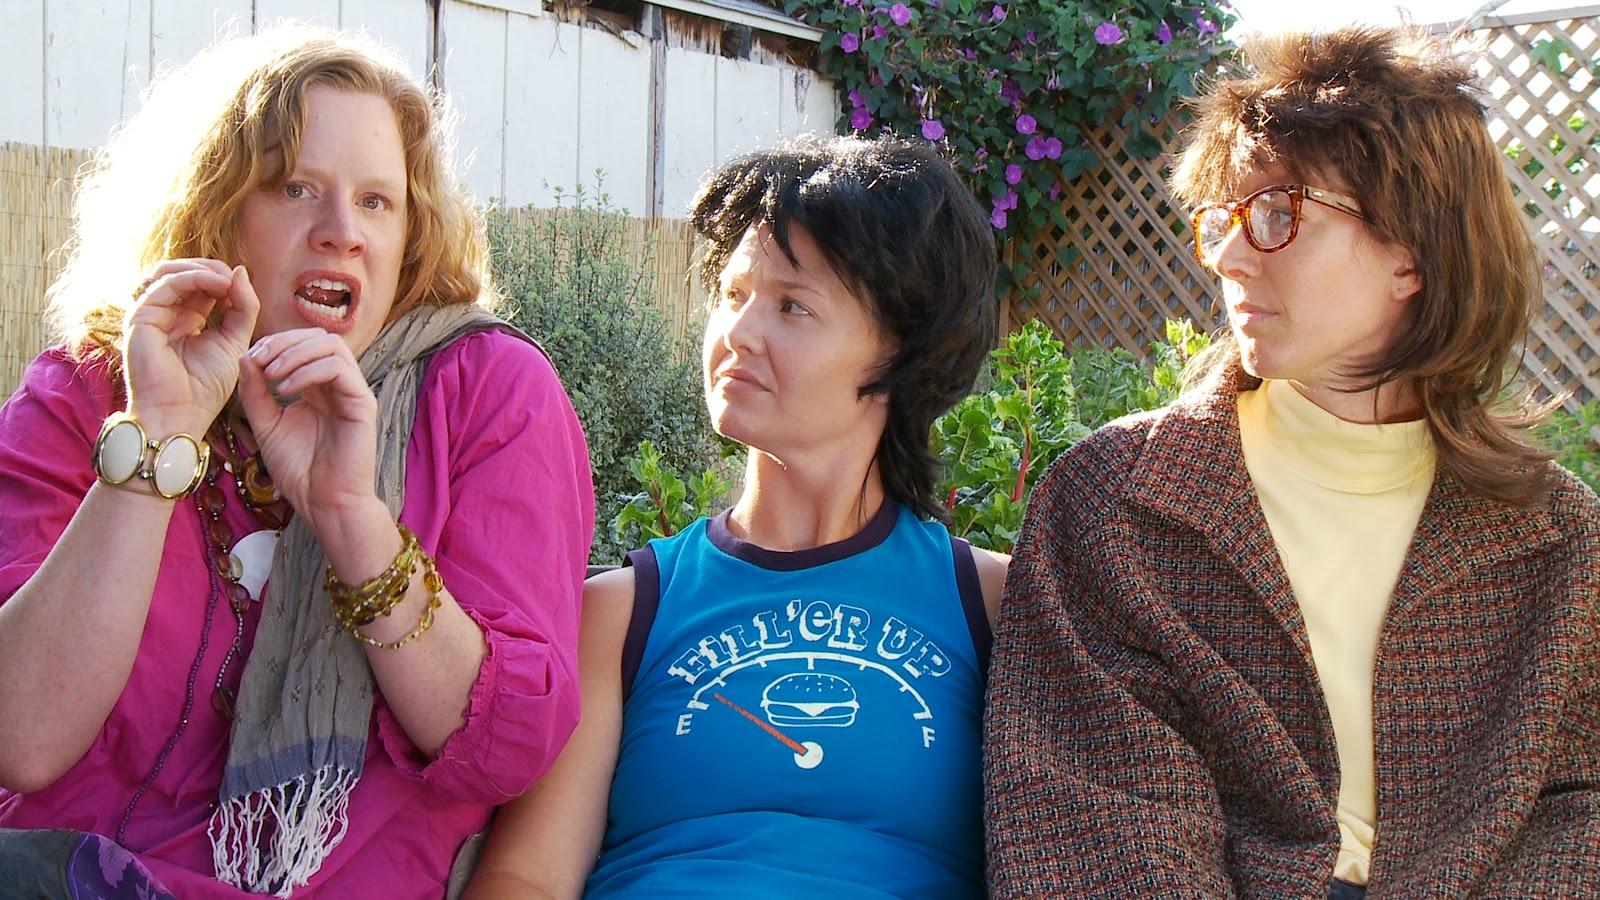 Plan Cul Sur Albi Avec Sandrine La Libertine Mature